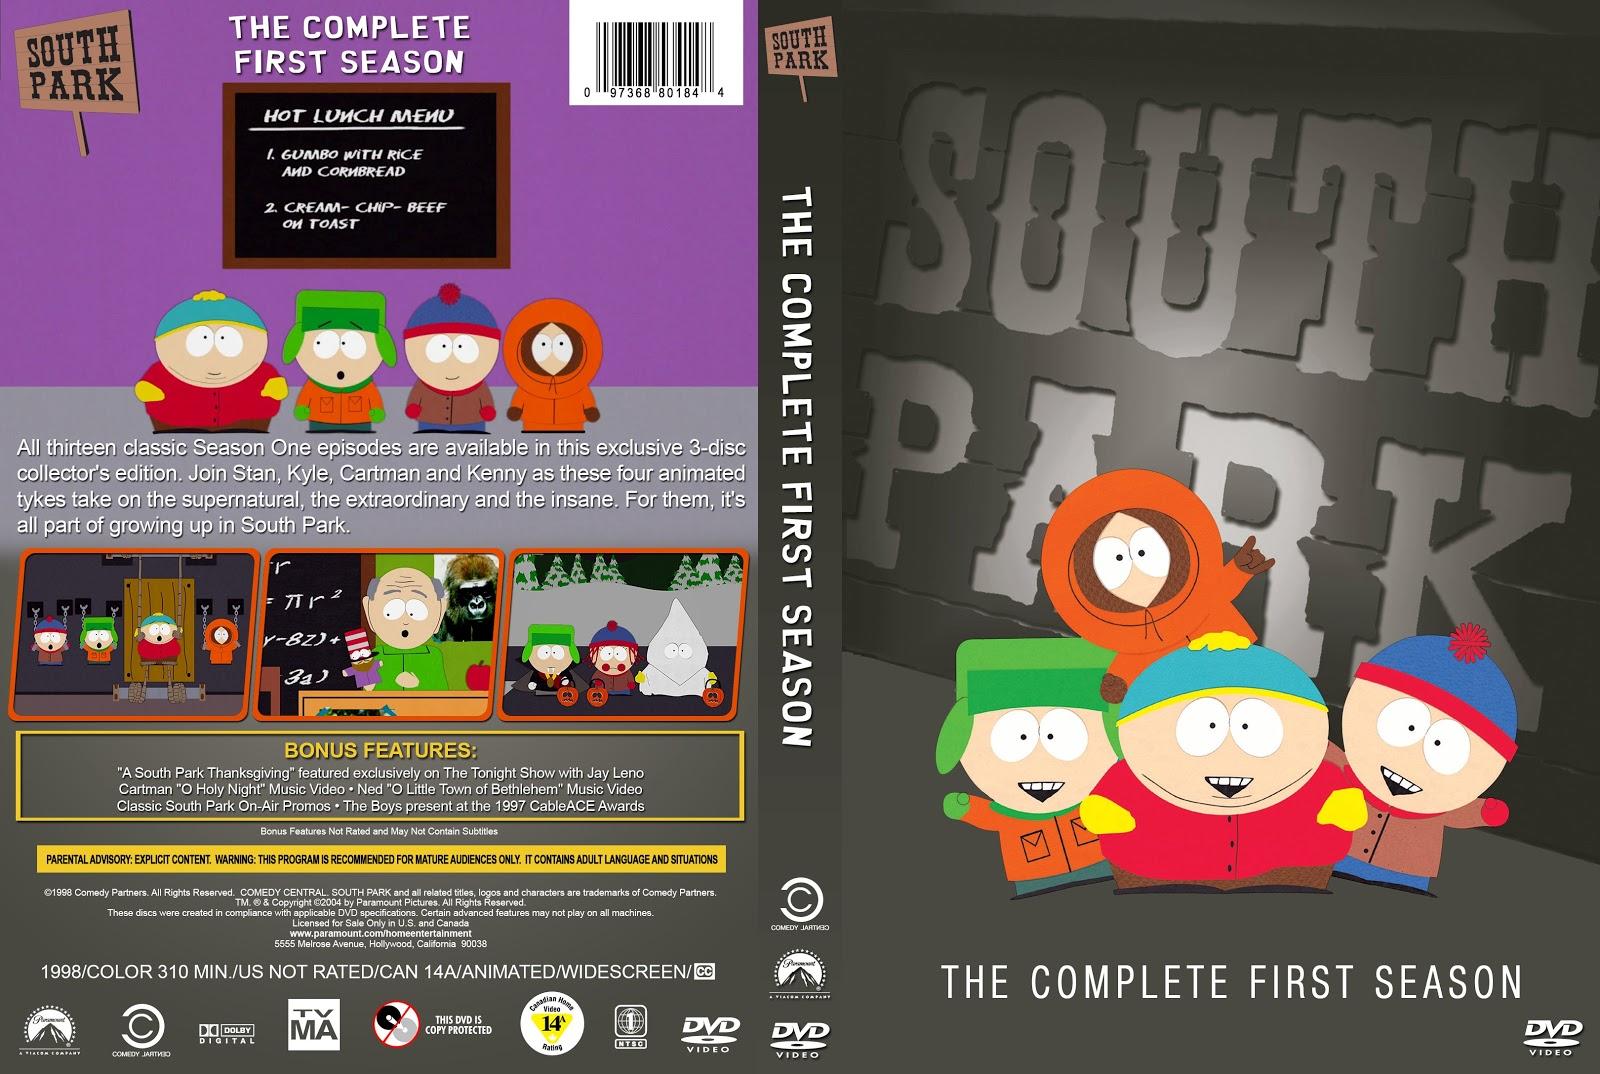 South Park Season 1-21 DVD Cover Collection